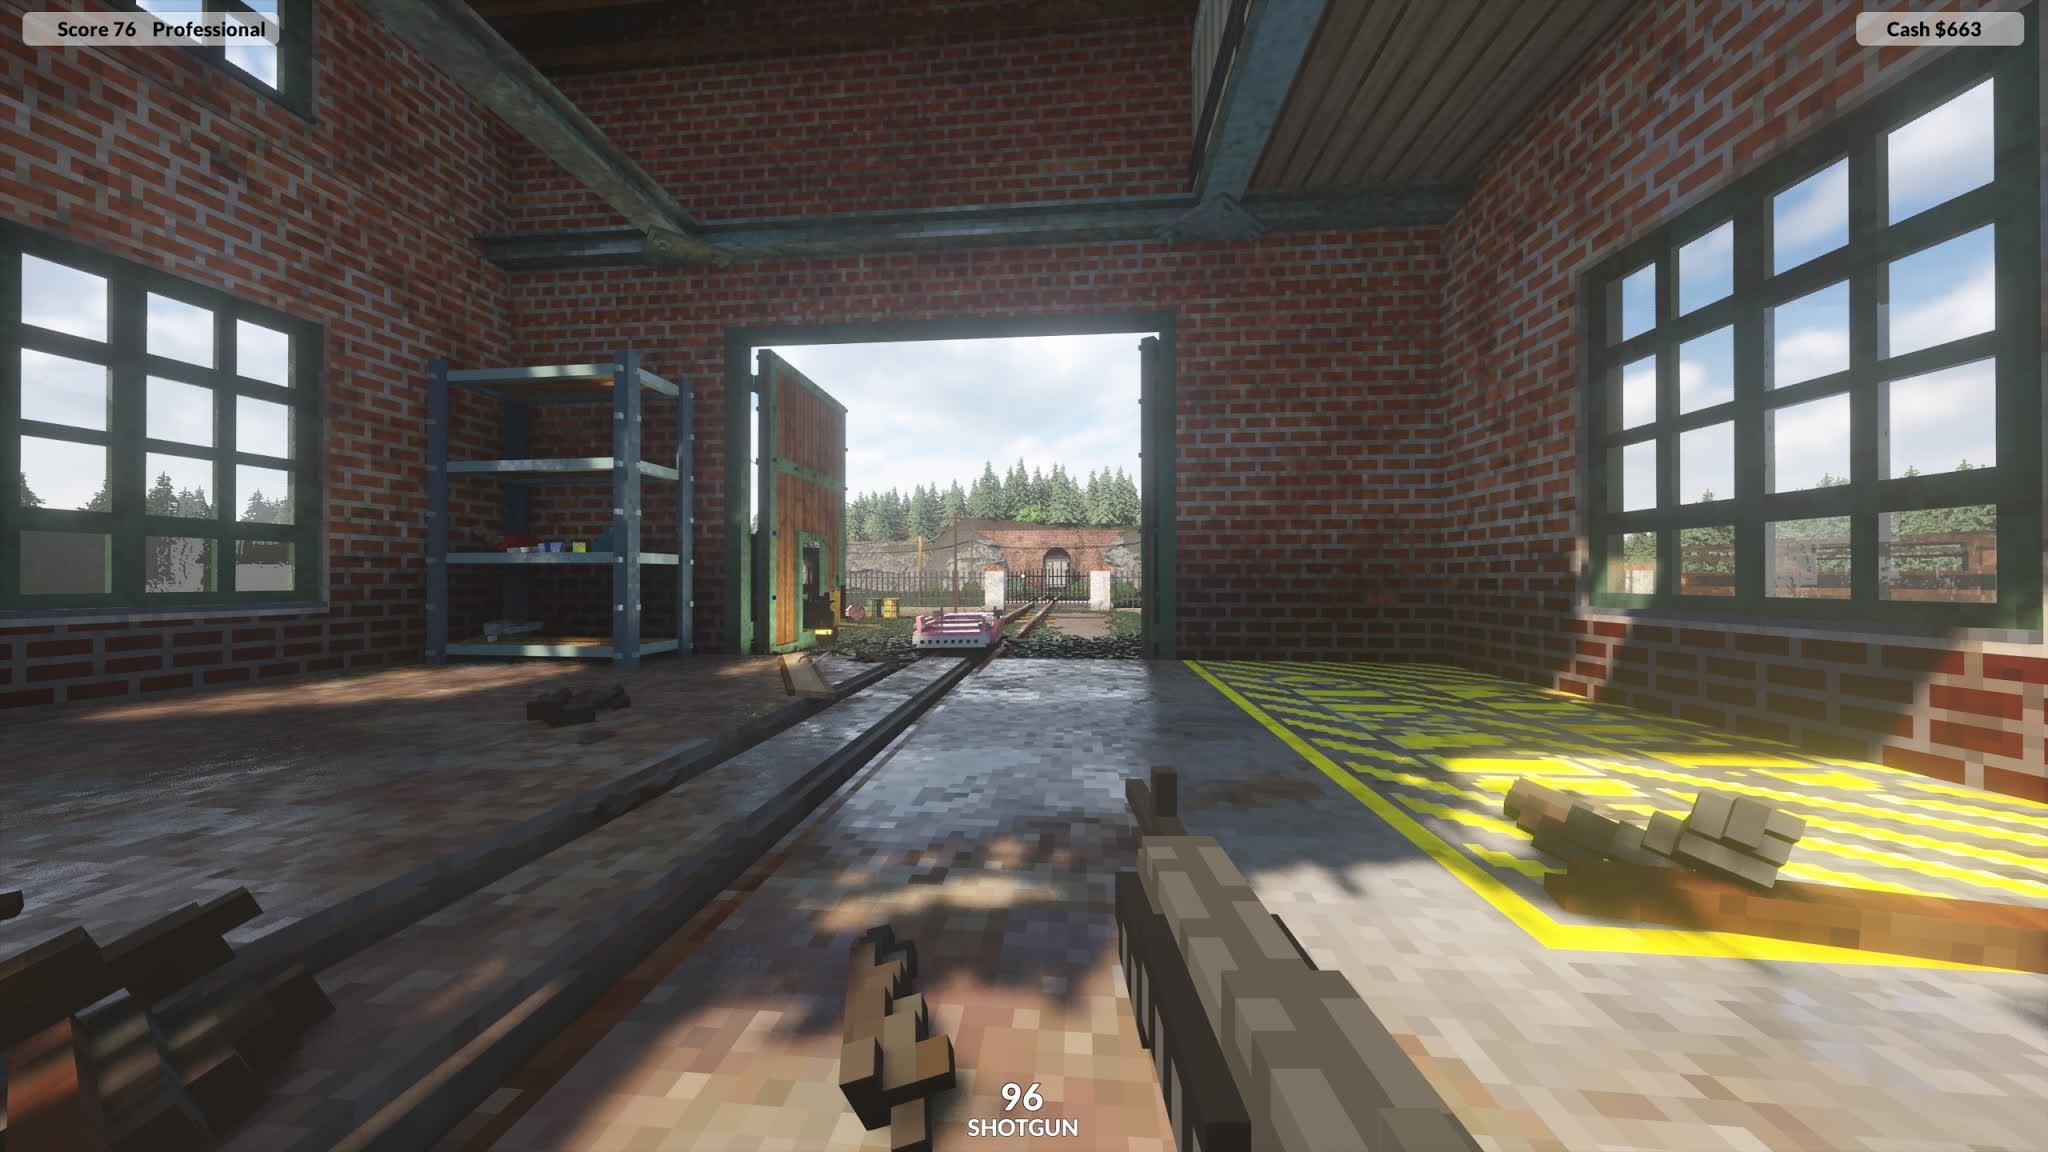 Teardown: Spas 12 automatic shotgun